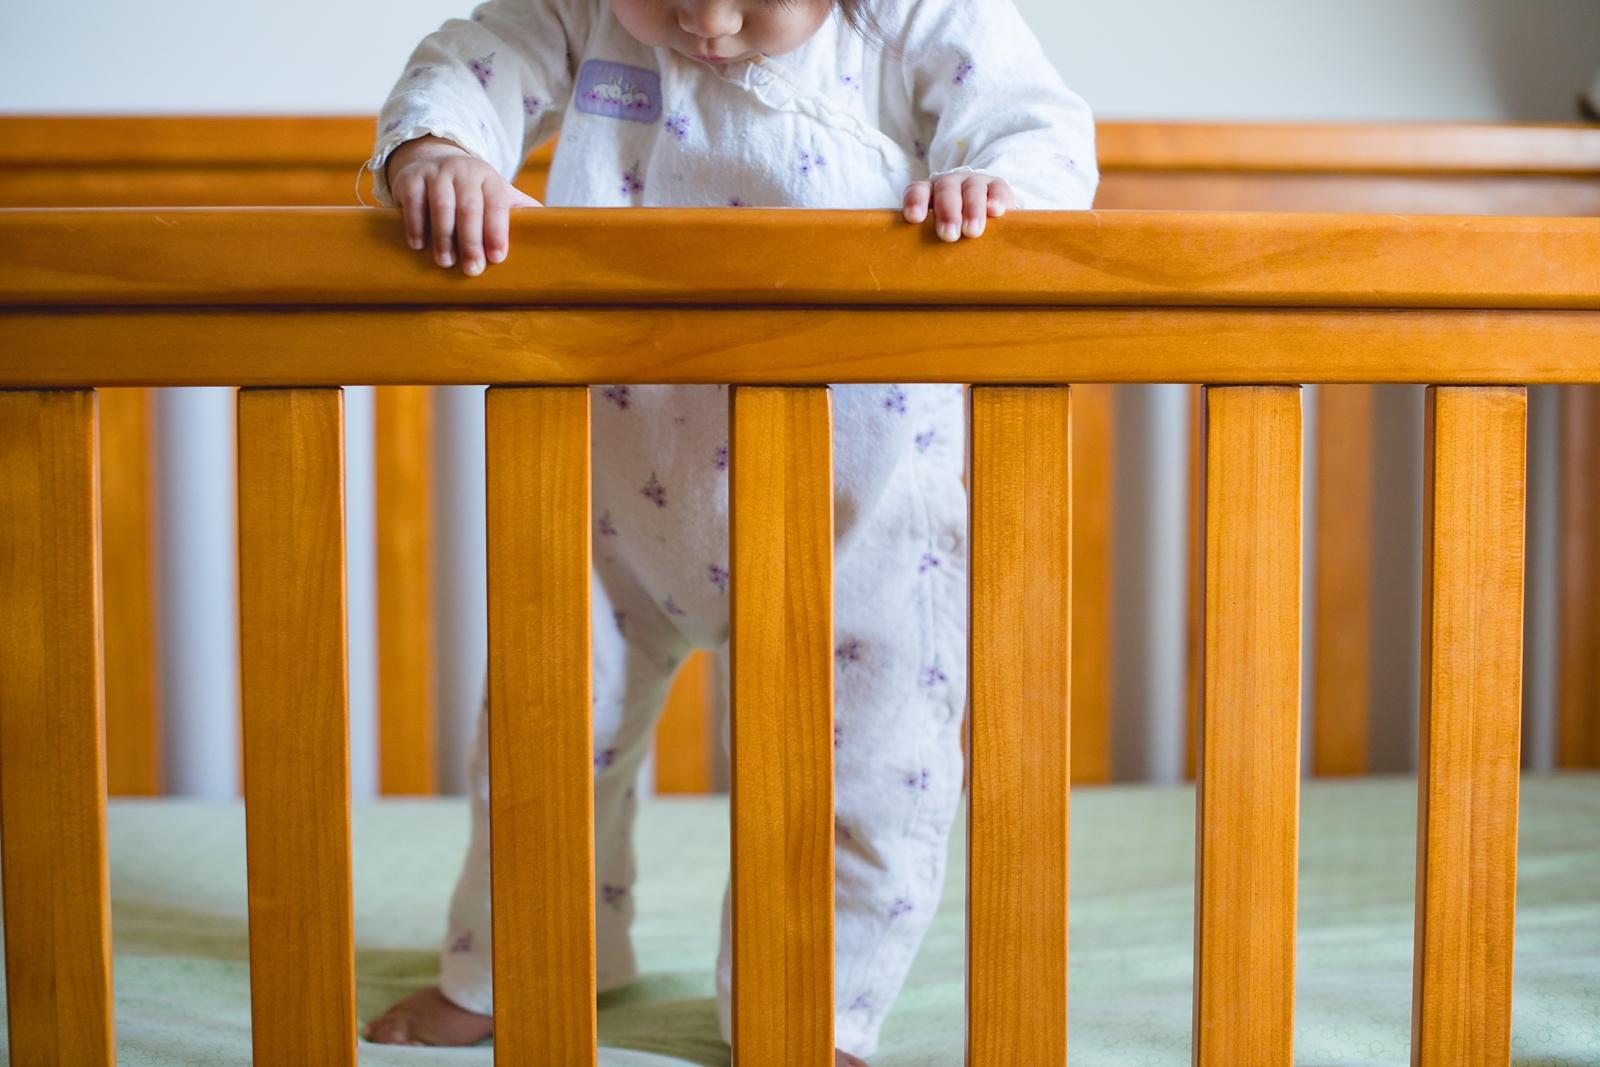 20130814-Amelia Stands in Crib-BLOGGrid_0005.jpg